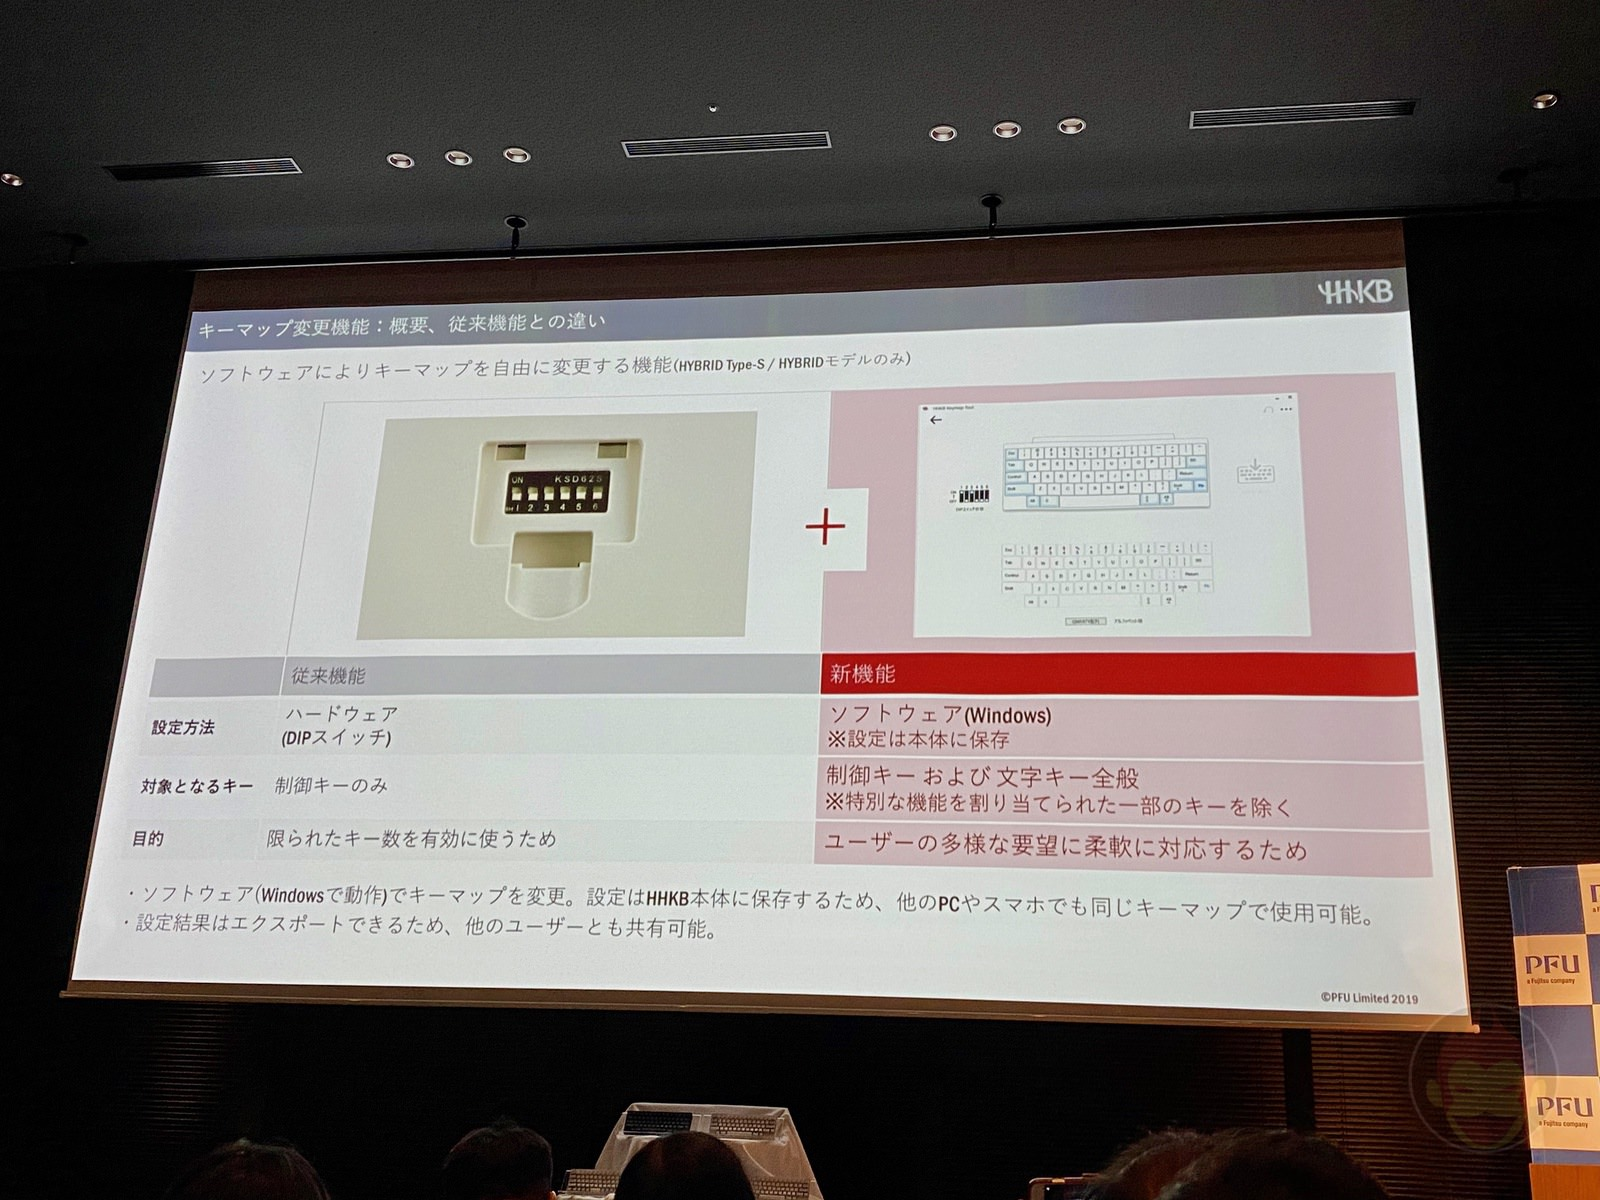 Happy-Hacking-Keyboard-New-Model-Presentation-07.jpeg